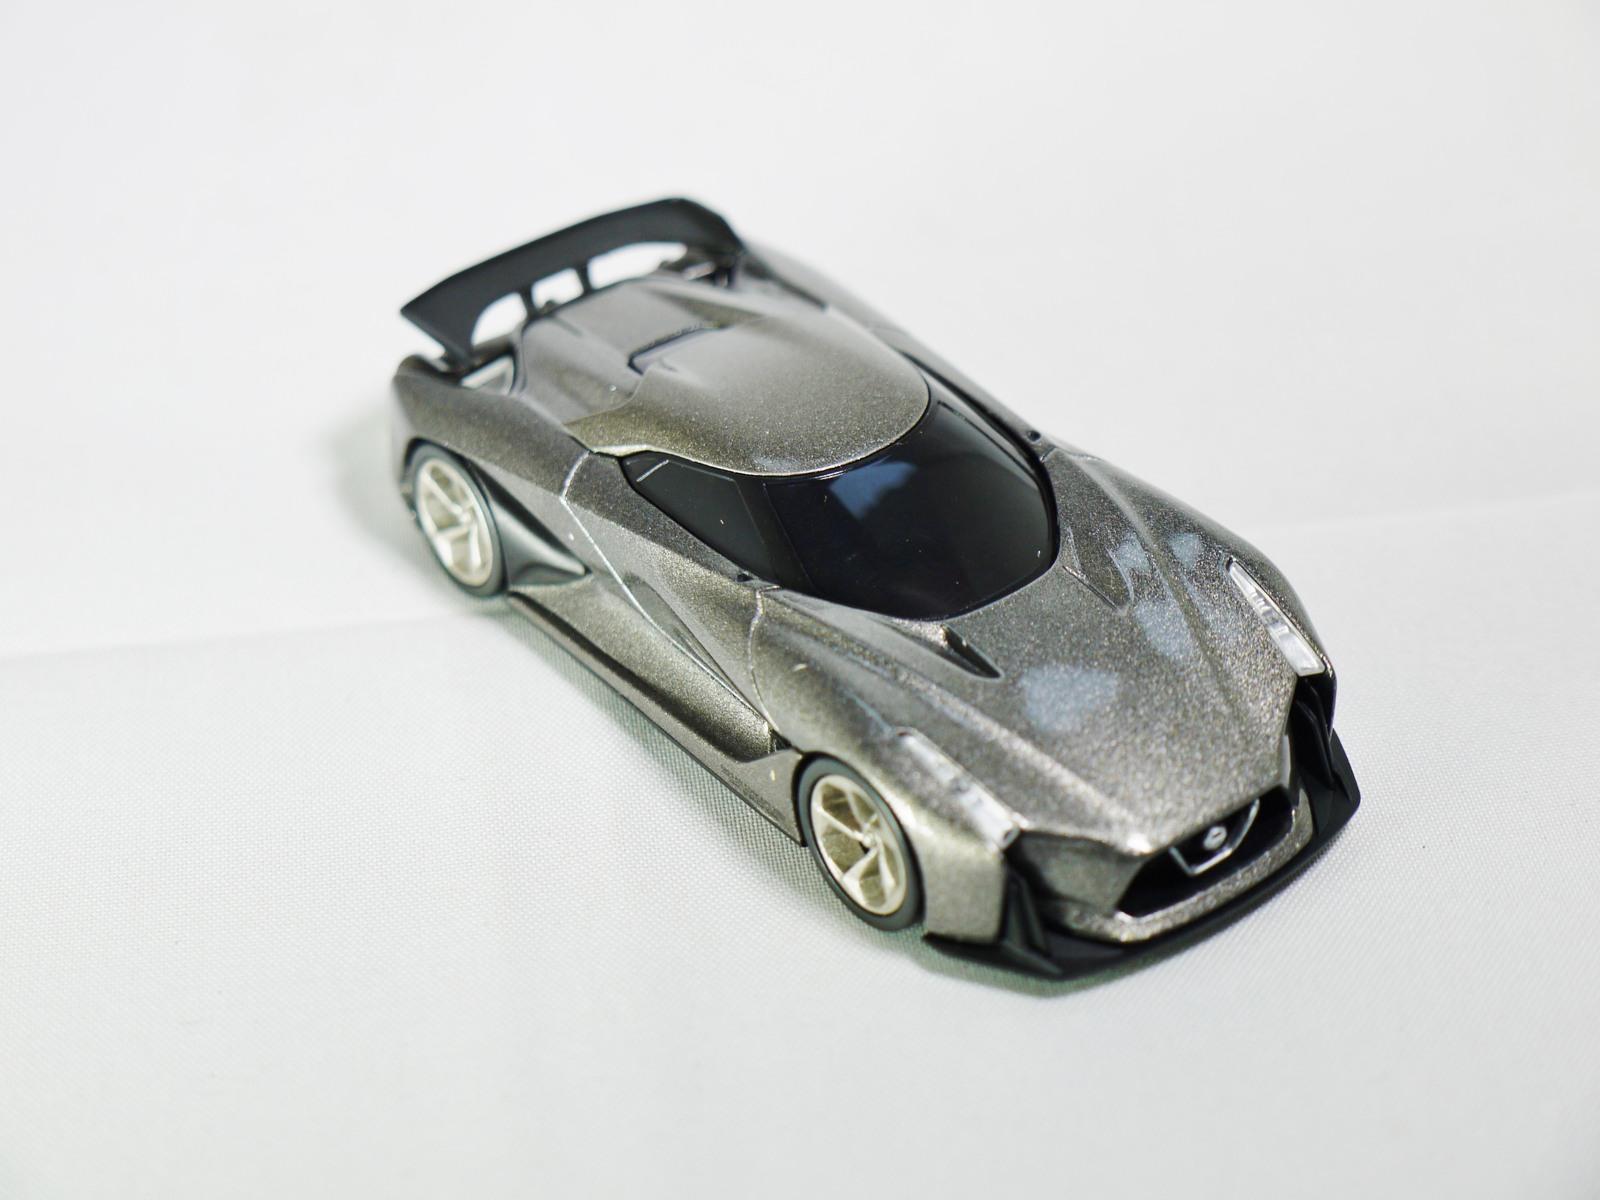 Tomytec tomica limited vintage neo   gt nissan concept 2020   vision gran turismo   grey   04